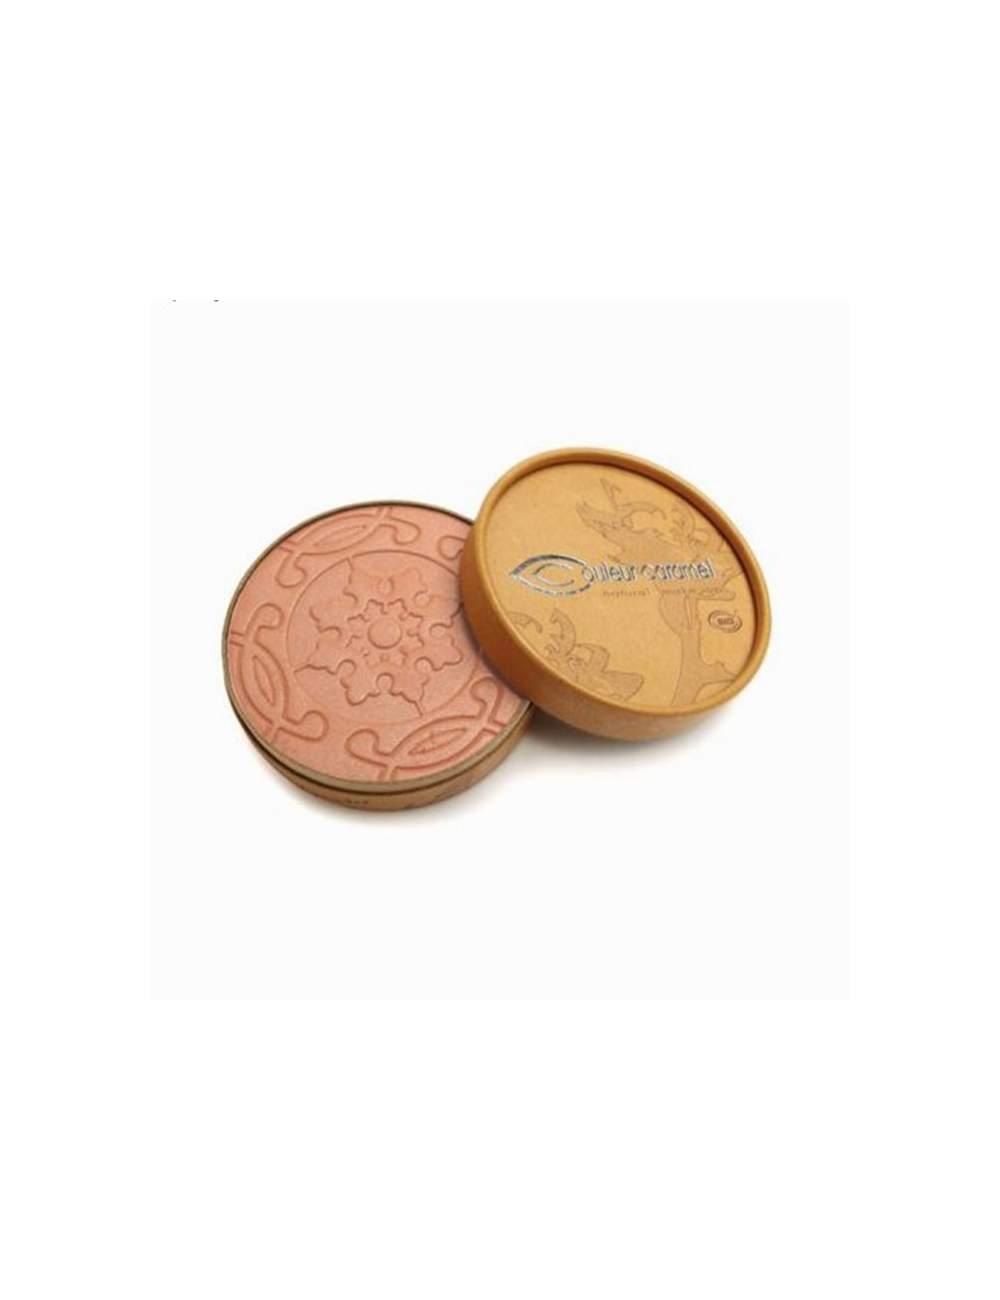 Poudres Bronzantes Bio Nacrés Terre Caramel 21 Rosy Brown. Couleur Caramel